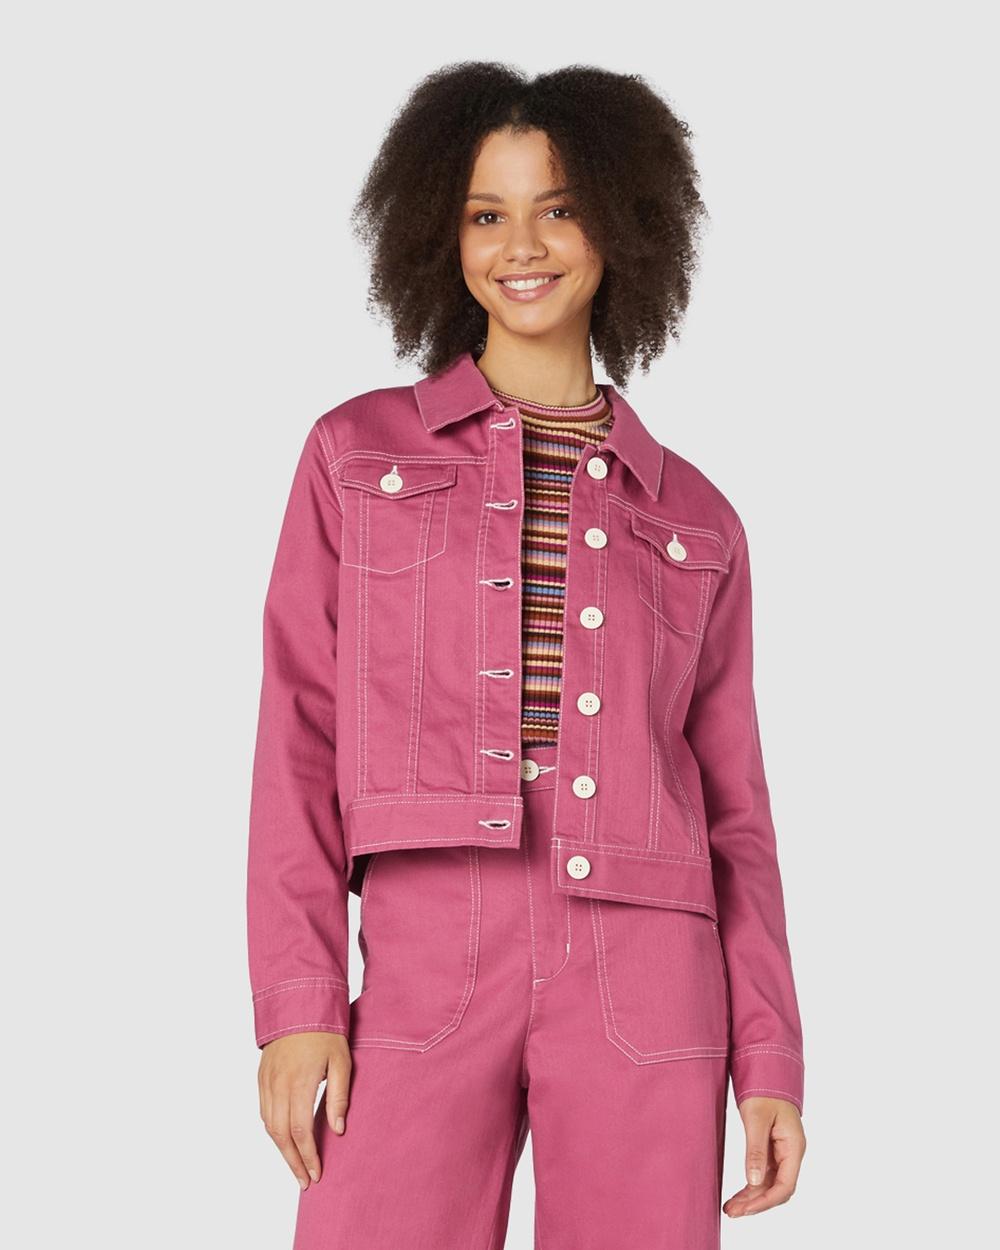 Princess Highway Angie Drill Jacket Denim jacket Pink Australia